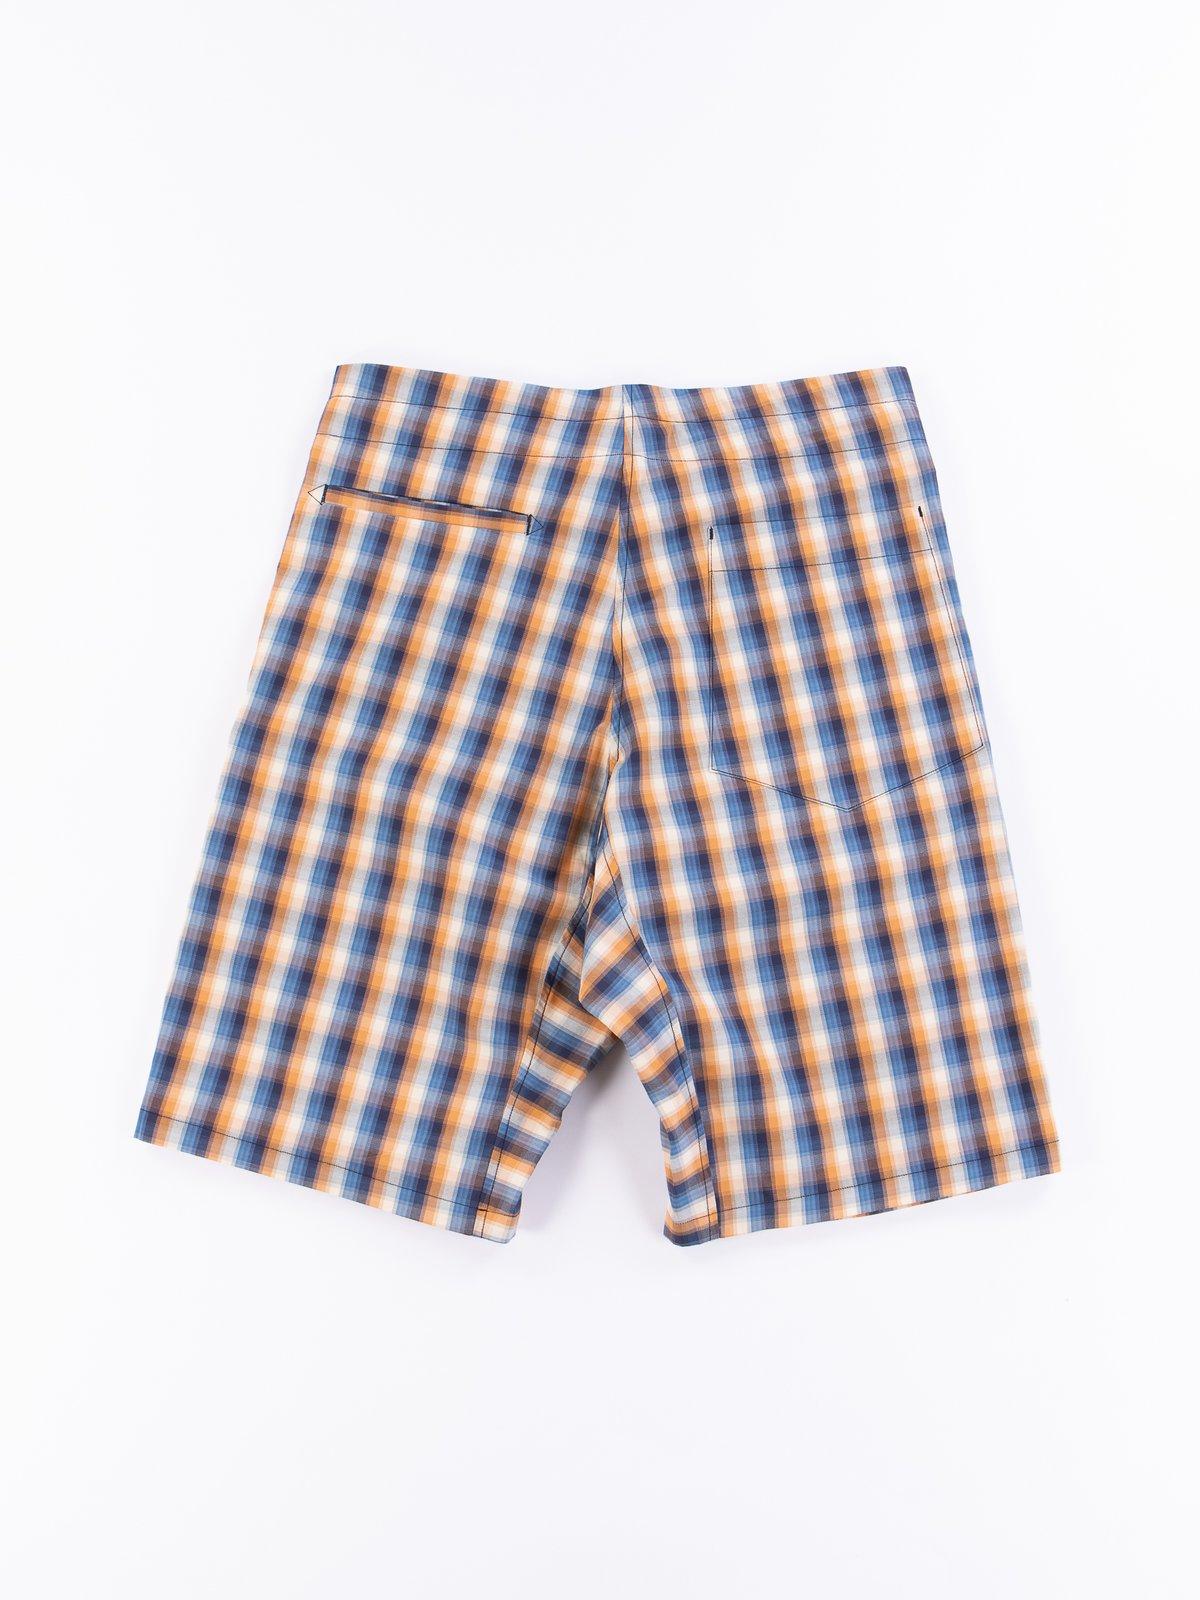 Blue/Orange Plaid Oxford Vancloth Drop Crotch Shorts - Image 4